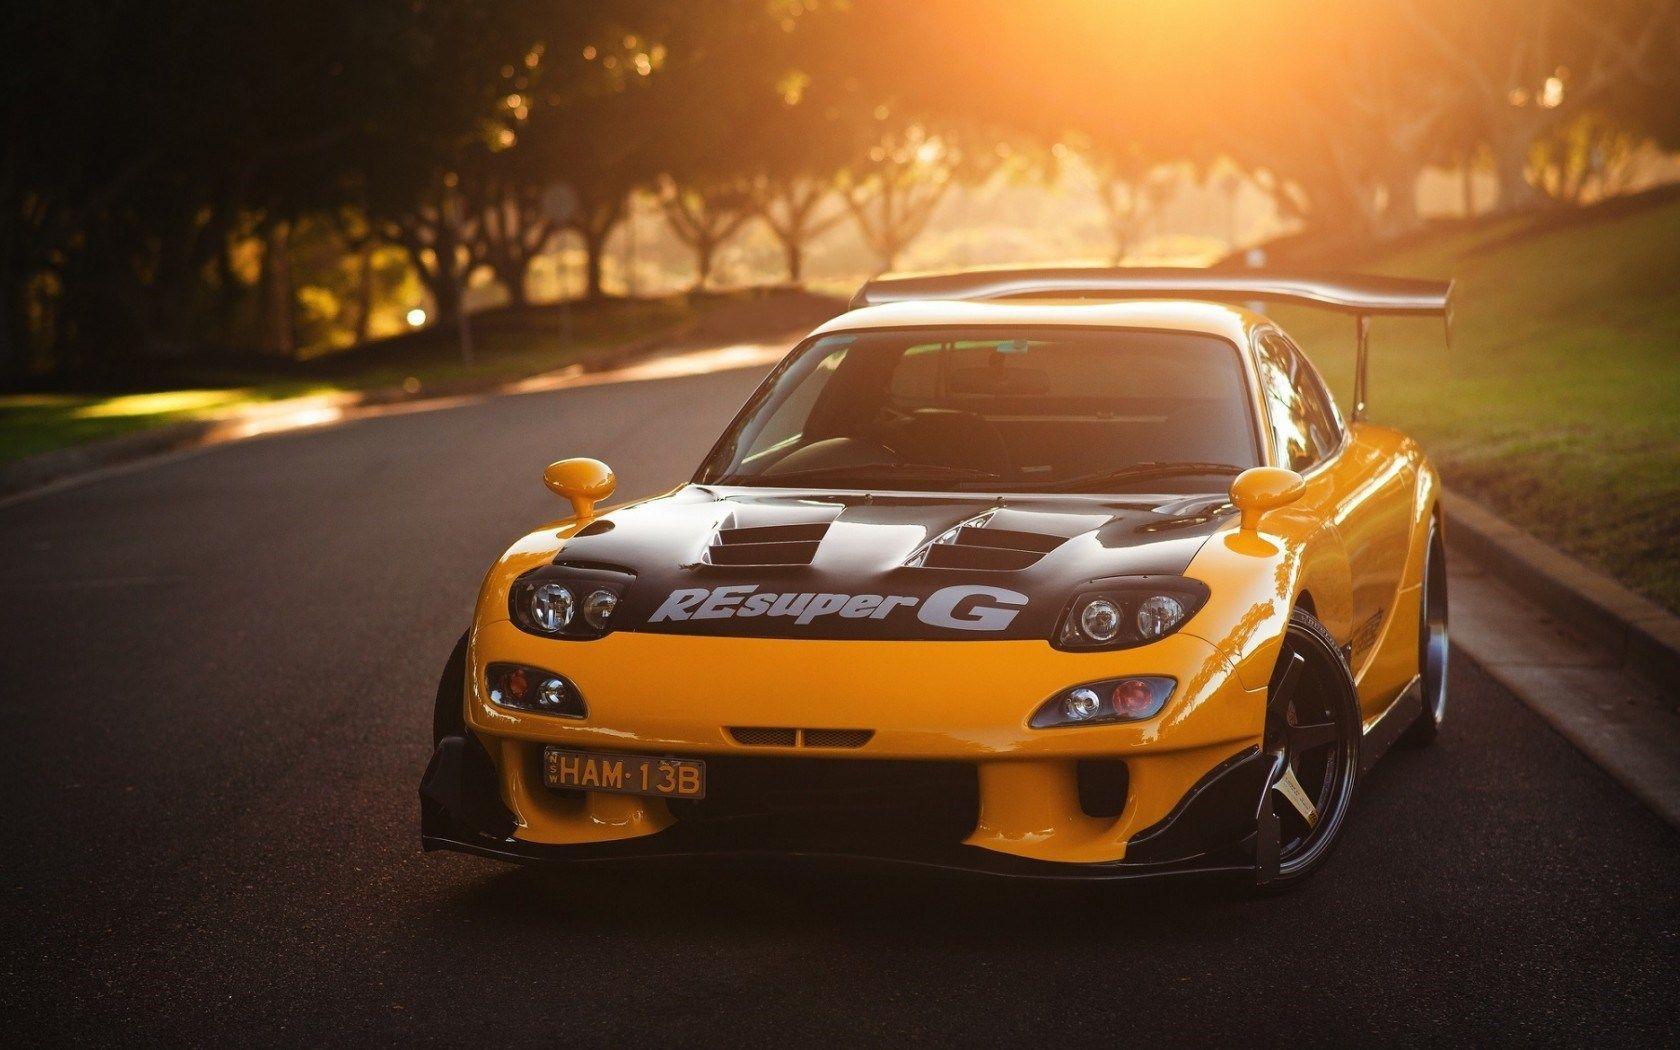 drift cars backgrounds - wallpaper cave